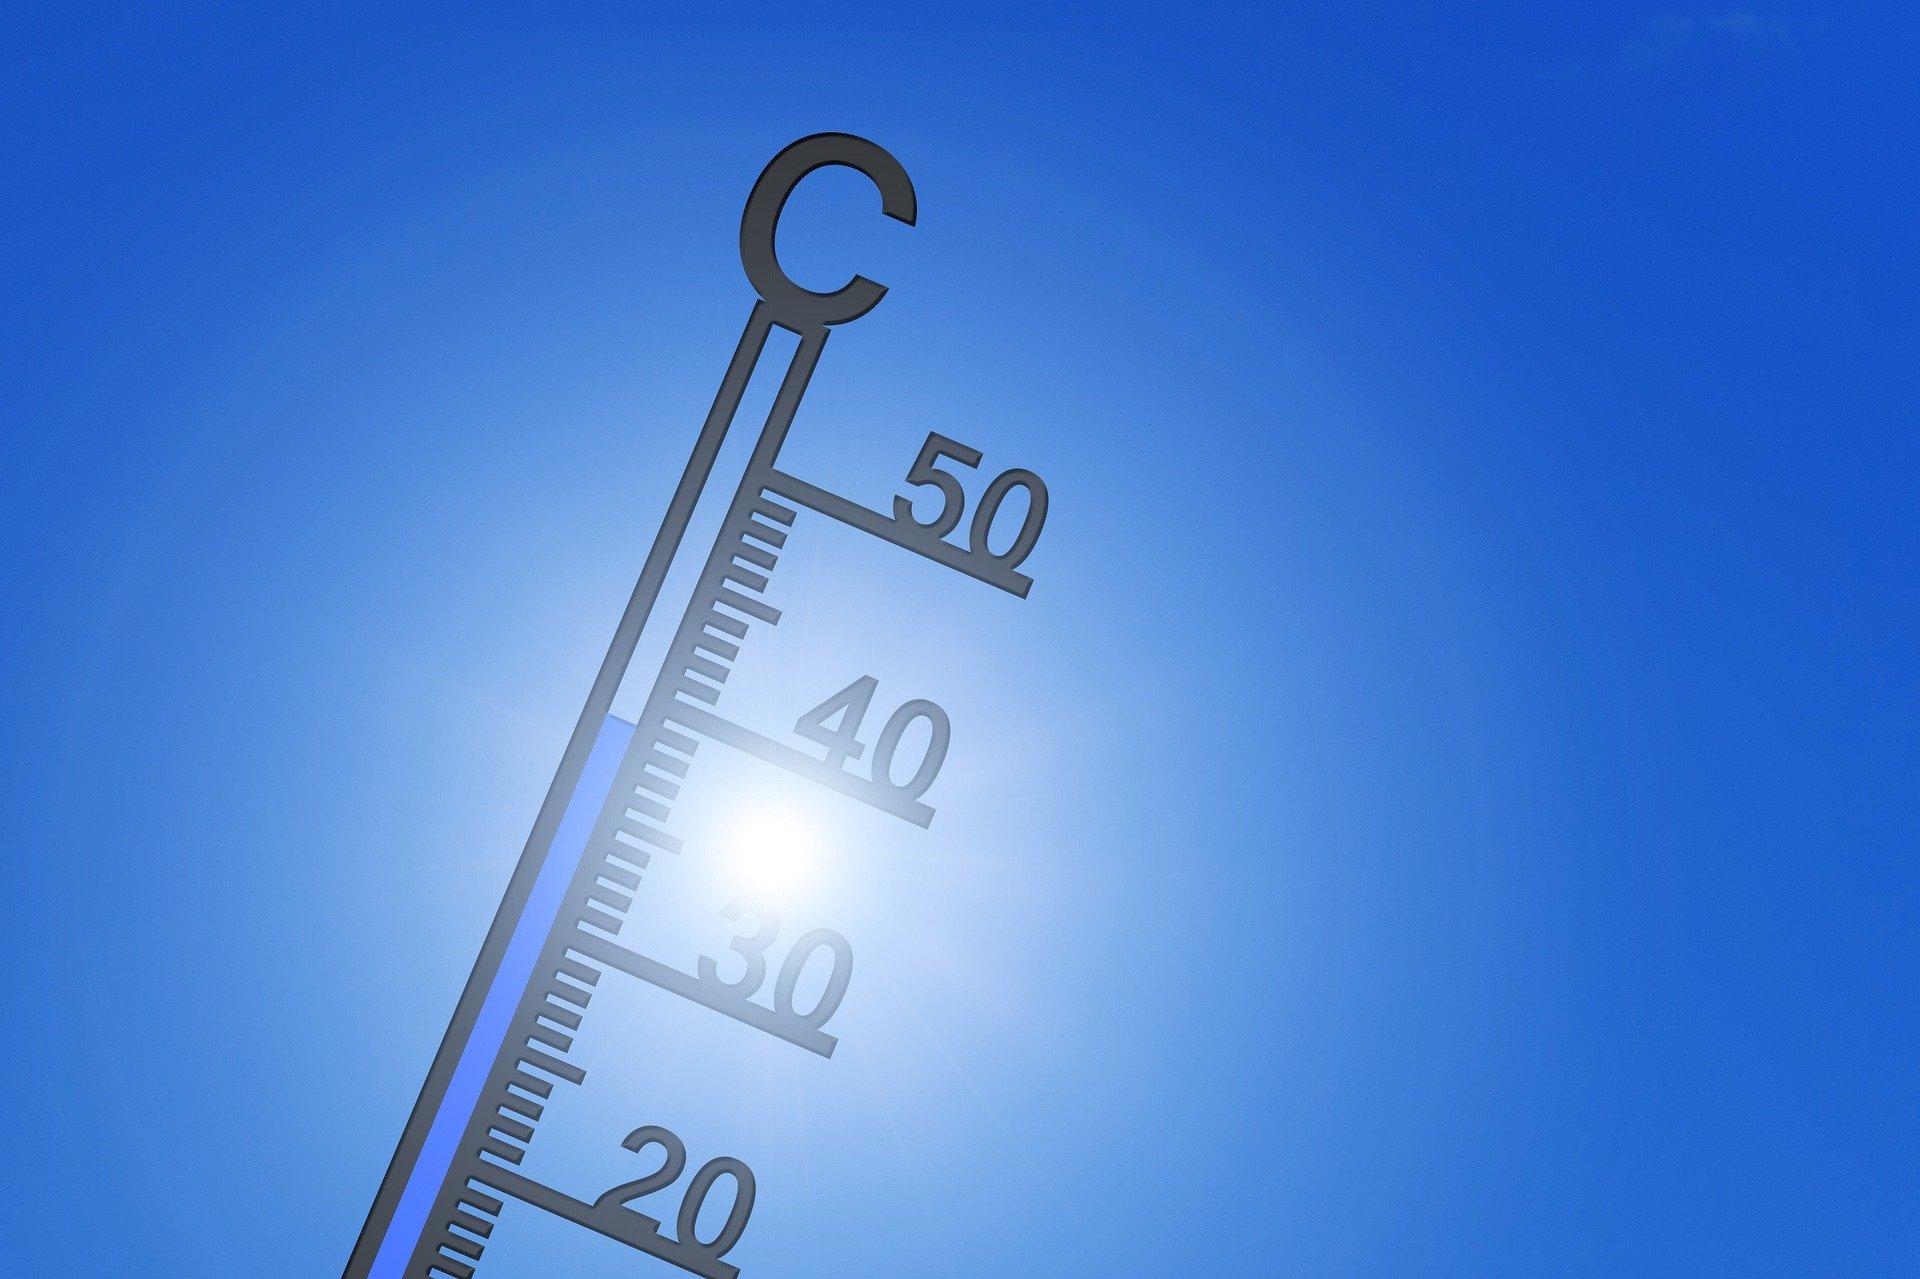 hittegolf,tropisch,zomers,temperatuur,binnenklimaat,zomer,oververhitting,hitteprotocol,hete dagen